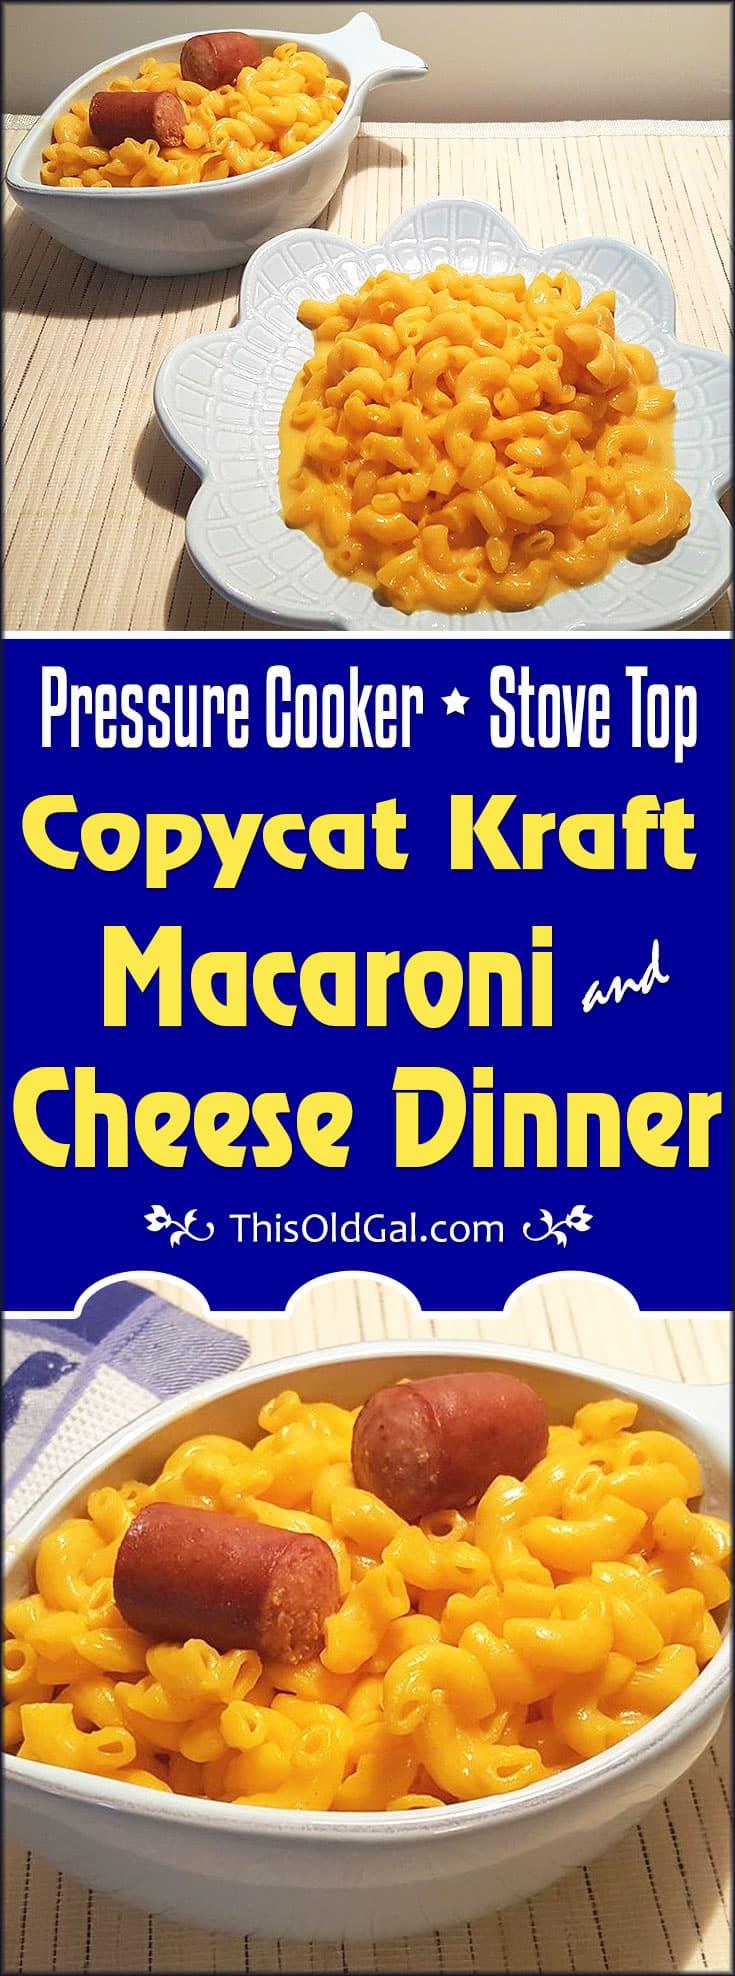 Copycat Kraft Macaroni & Cheese Dinner (Pressure Cooker or Stove Top)